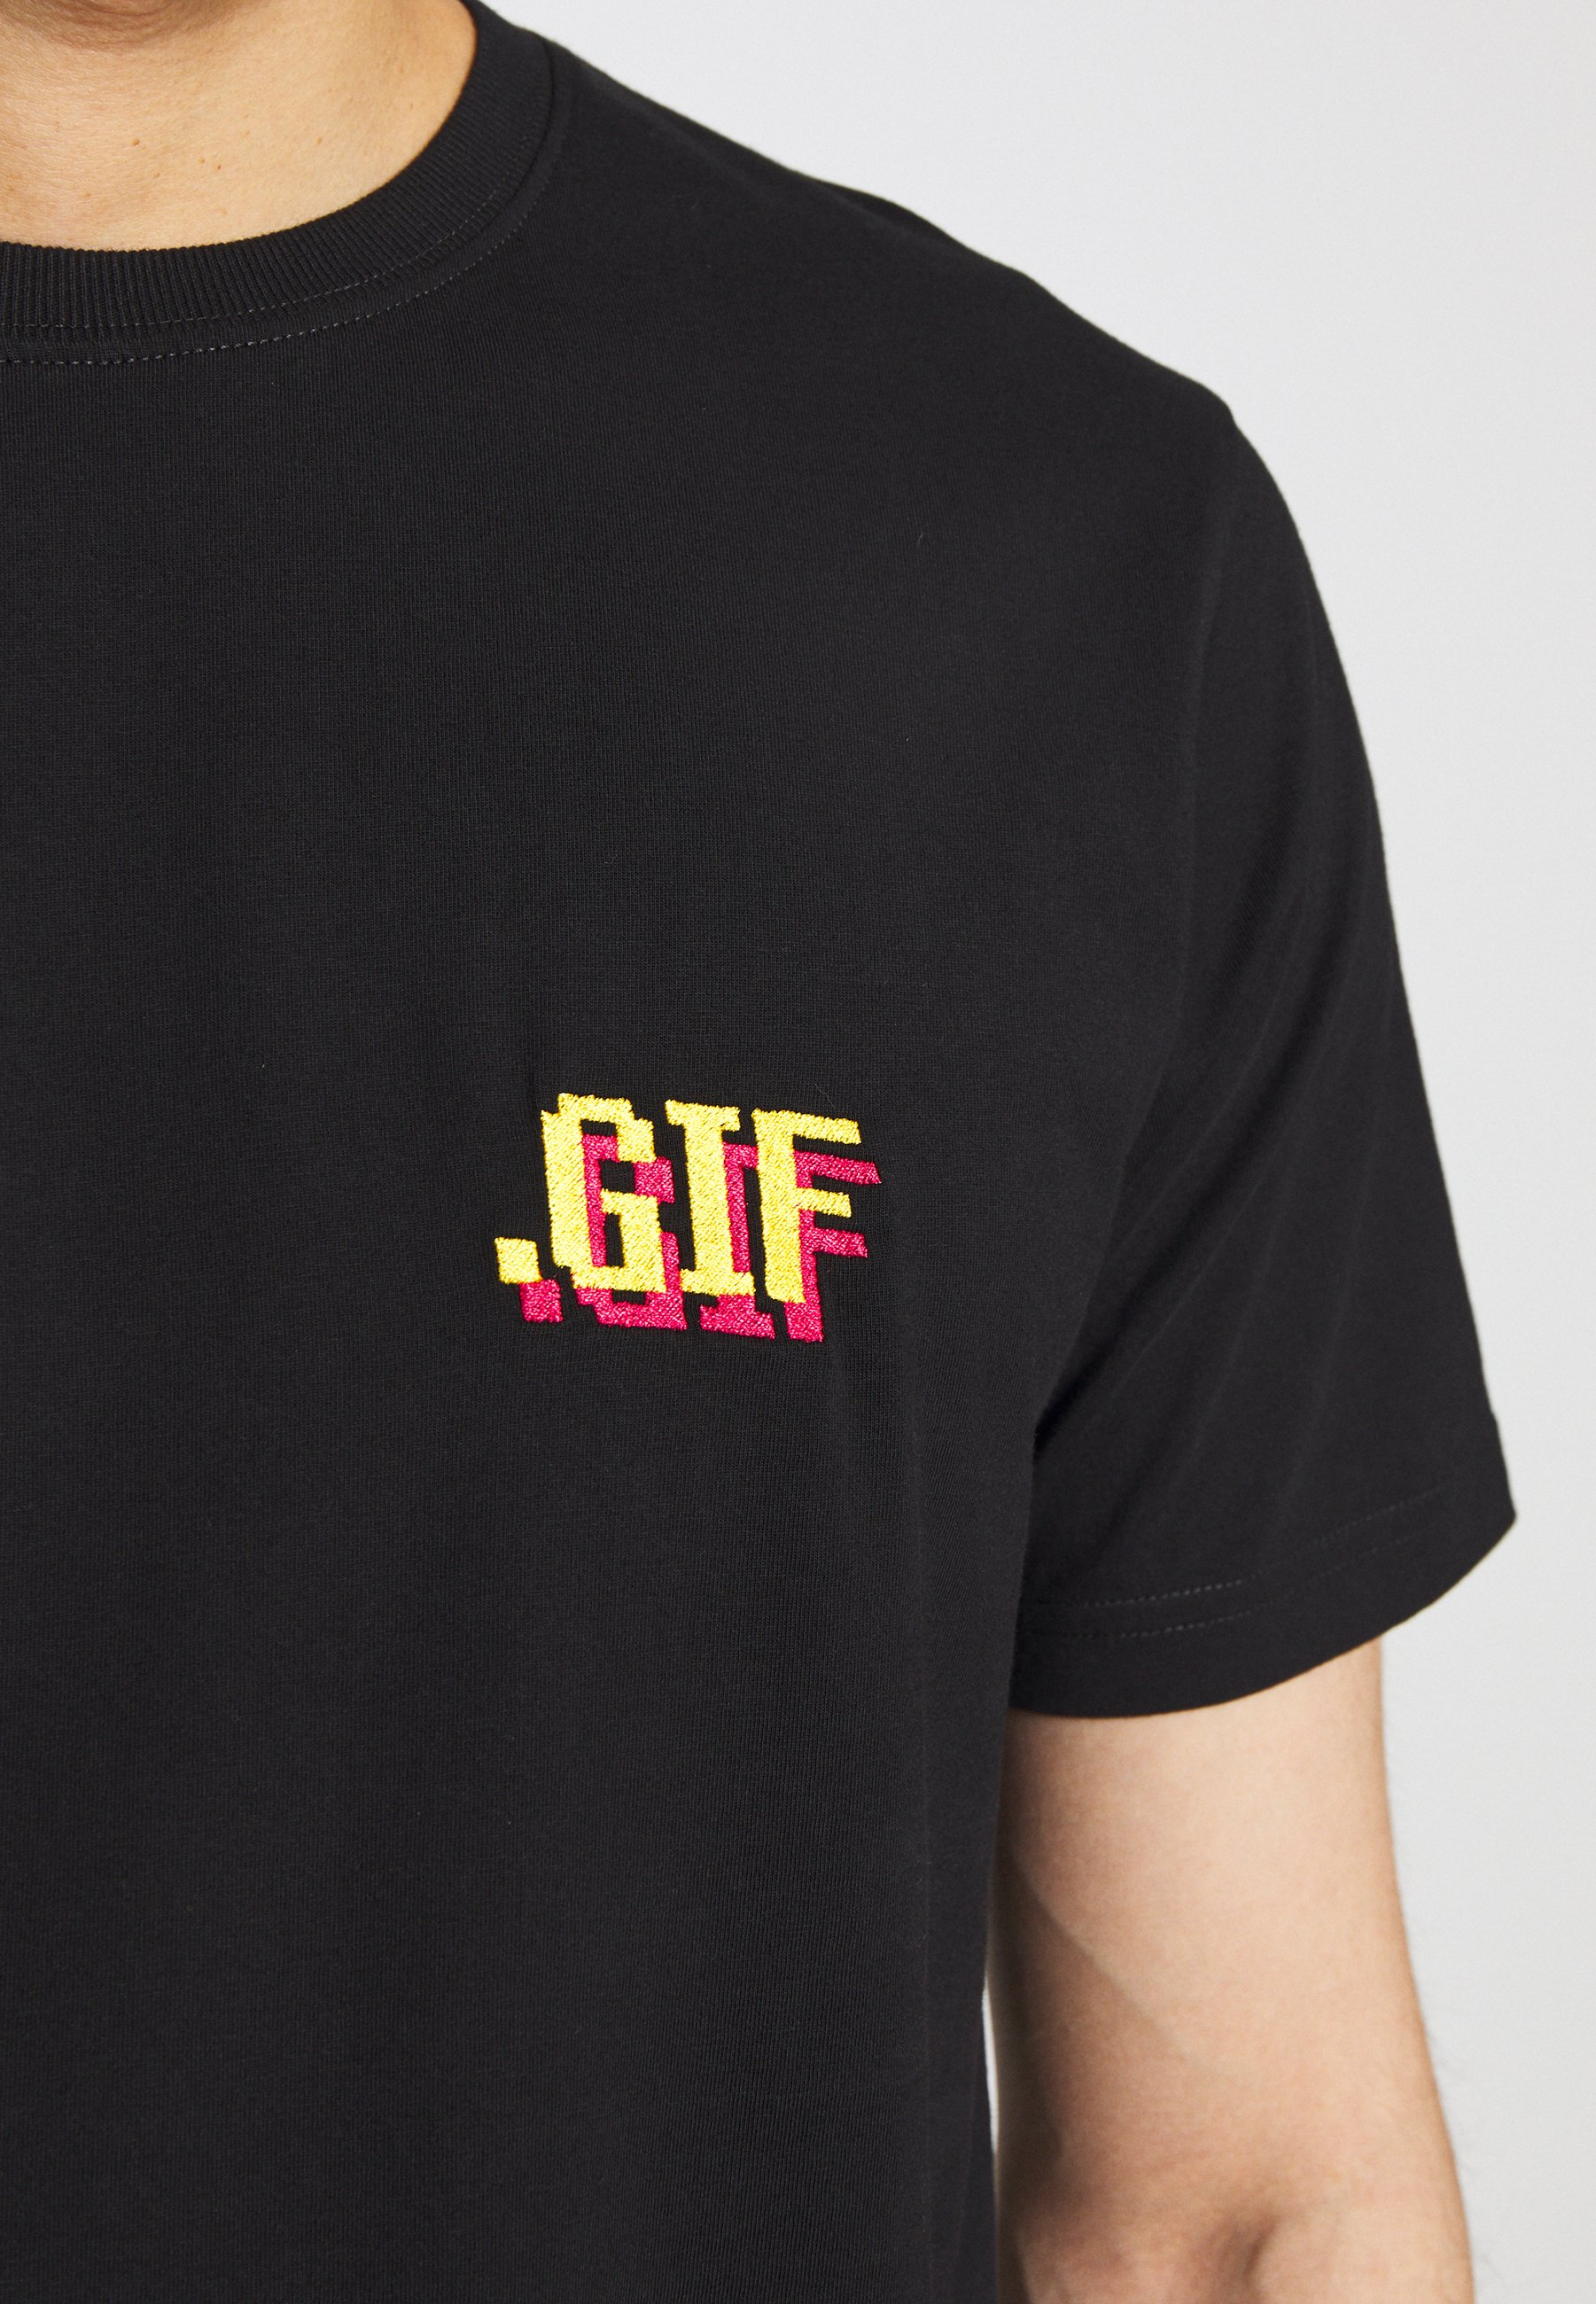 Bricktown Small - T-shirt Med Print Black